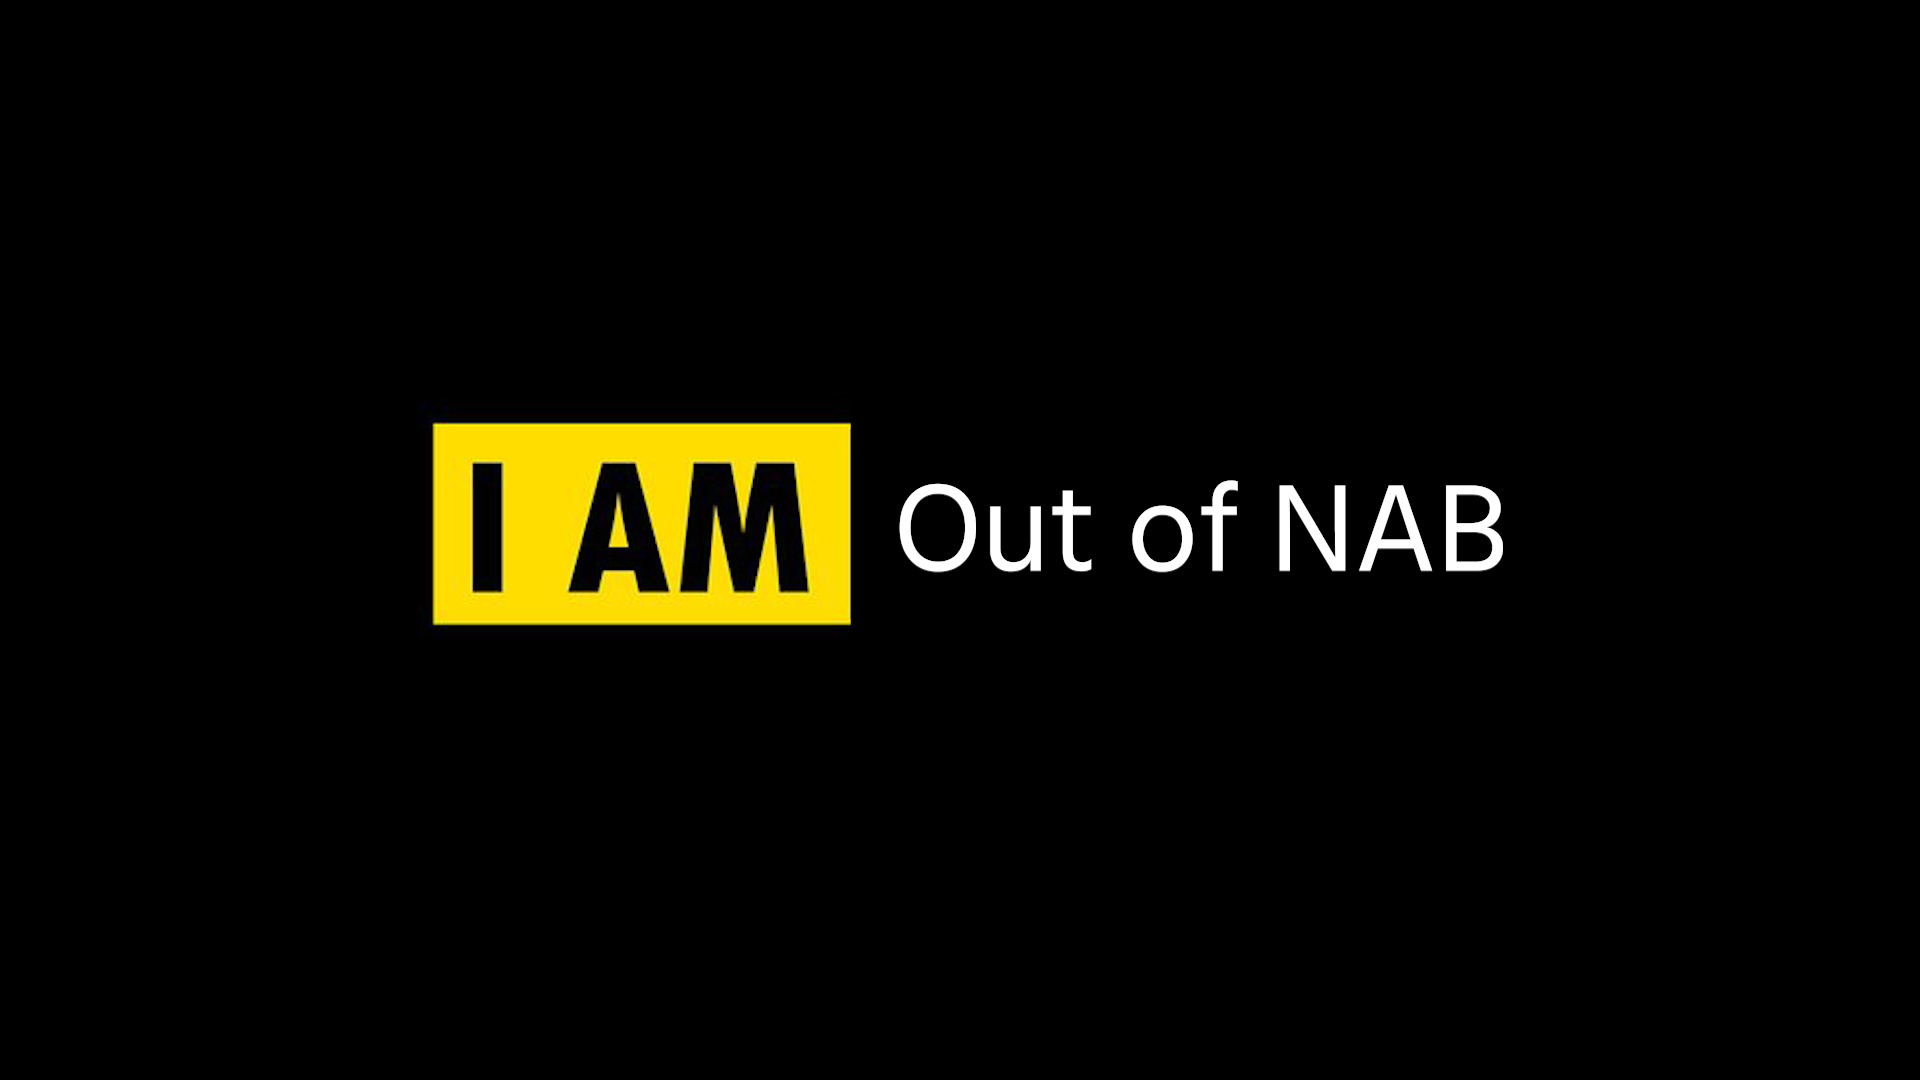 Nikon se va de la NAB 2020 en medio de preocupaciones por la gripe del coronavirus